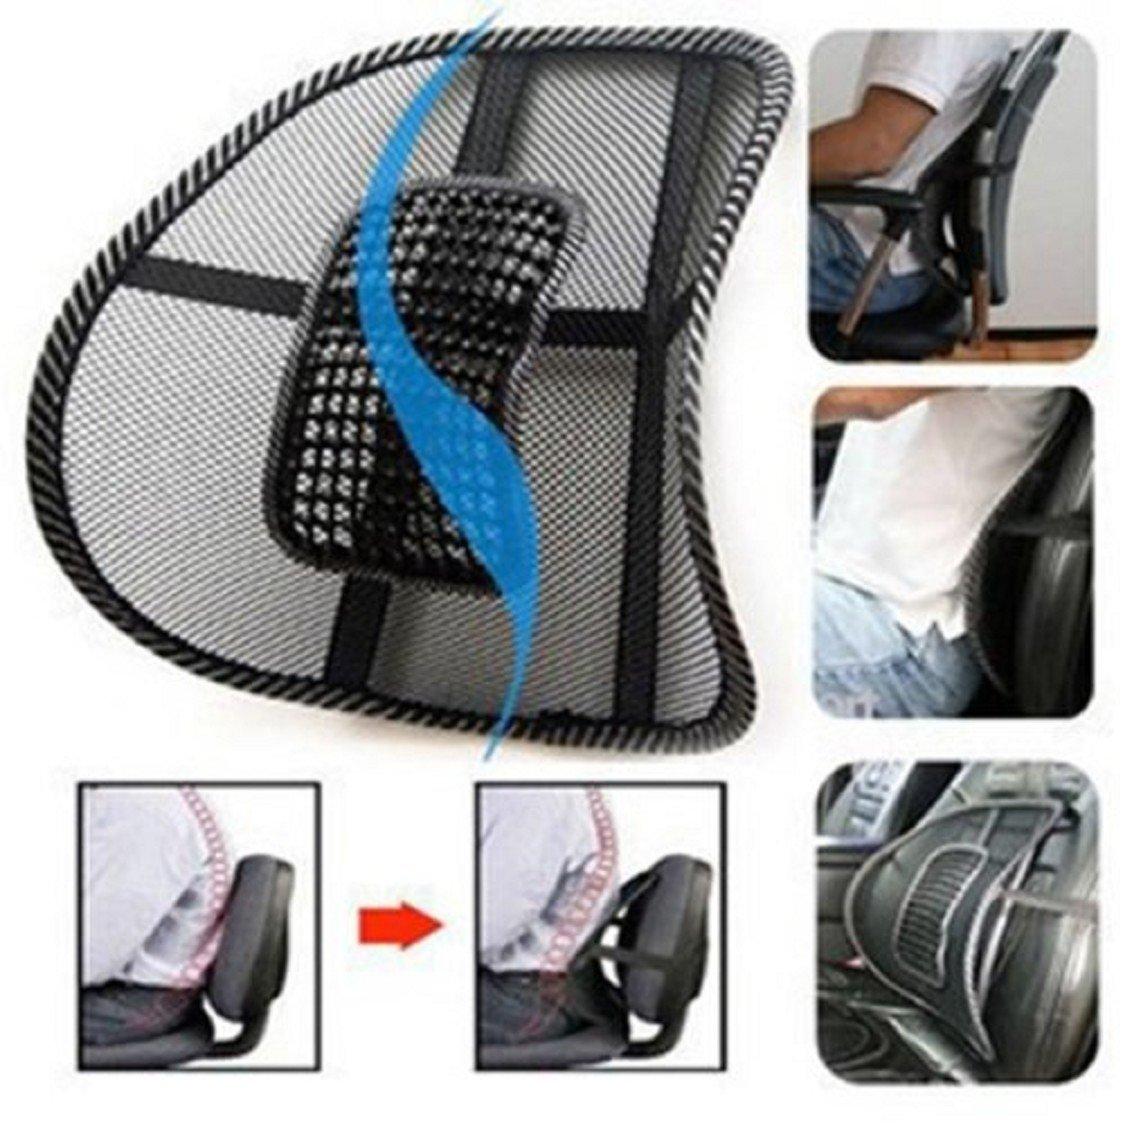 Naladoo Black Mesh Lumbar Back Brace Support Office Home Car Seat Chair Cushion IU32566436436